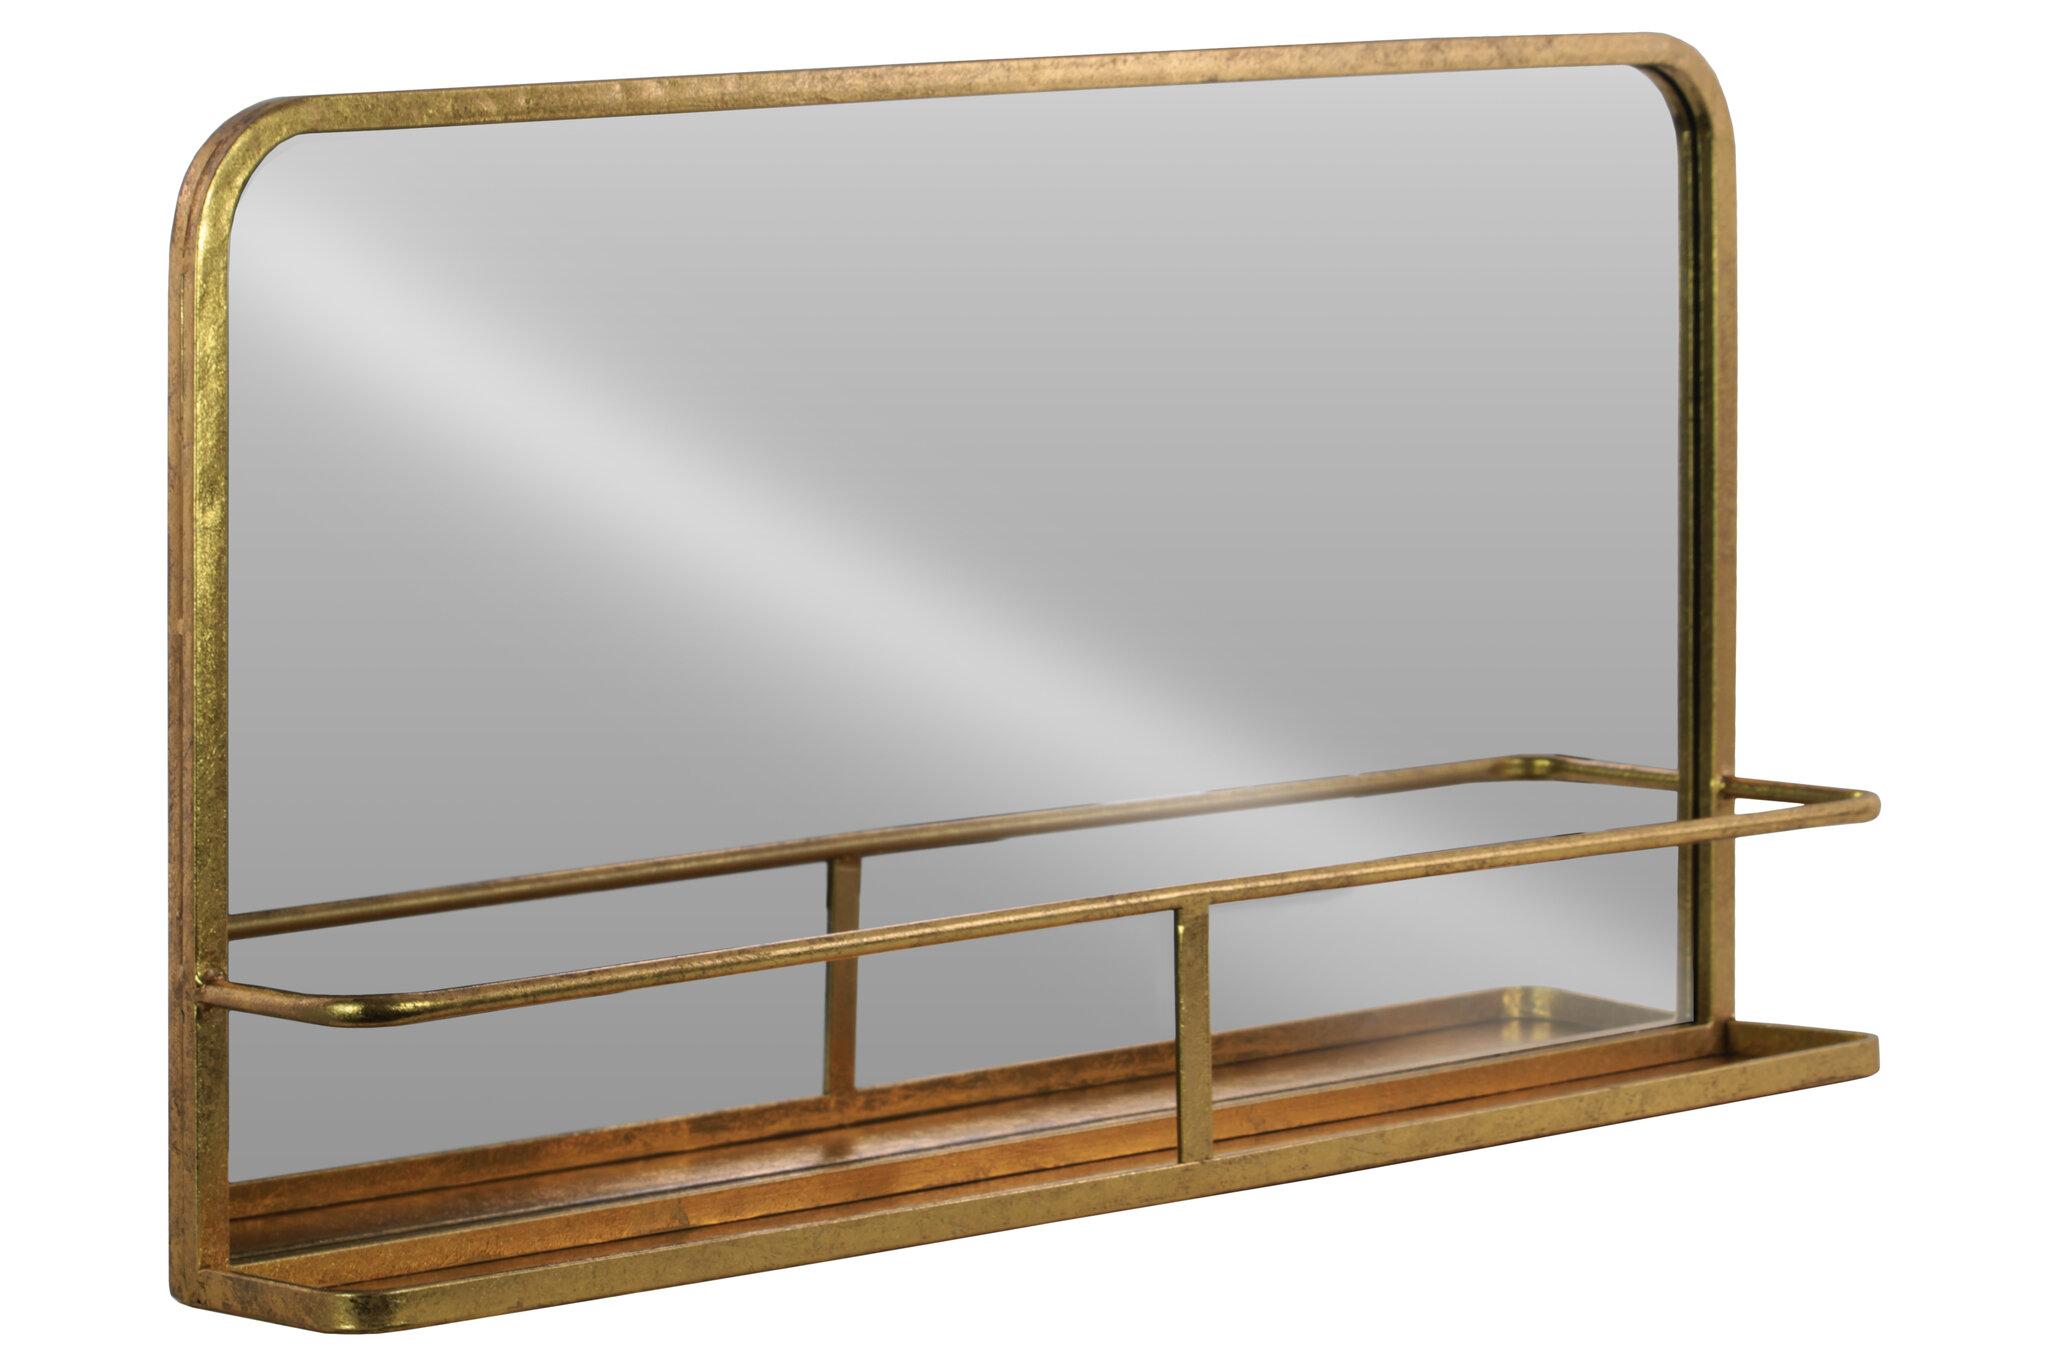 Gracie oaks dalston rectangle metal wall mirror with shelf wayfair